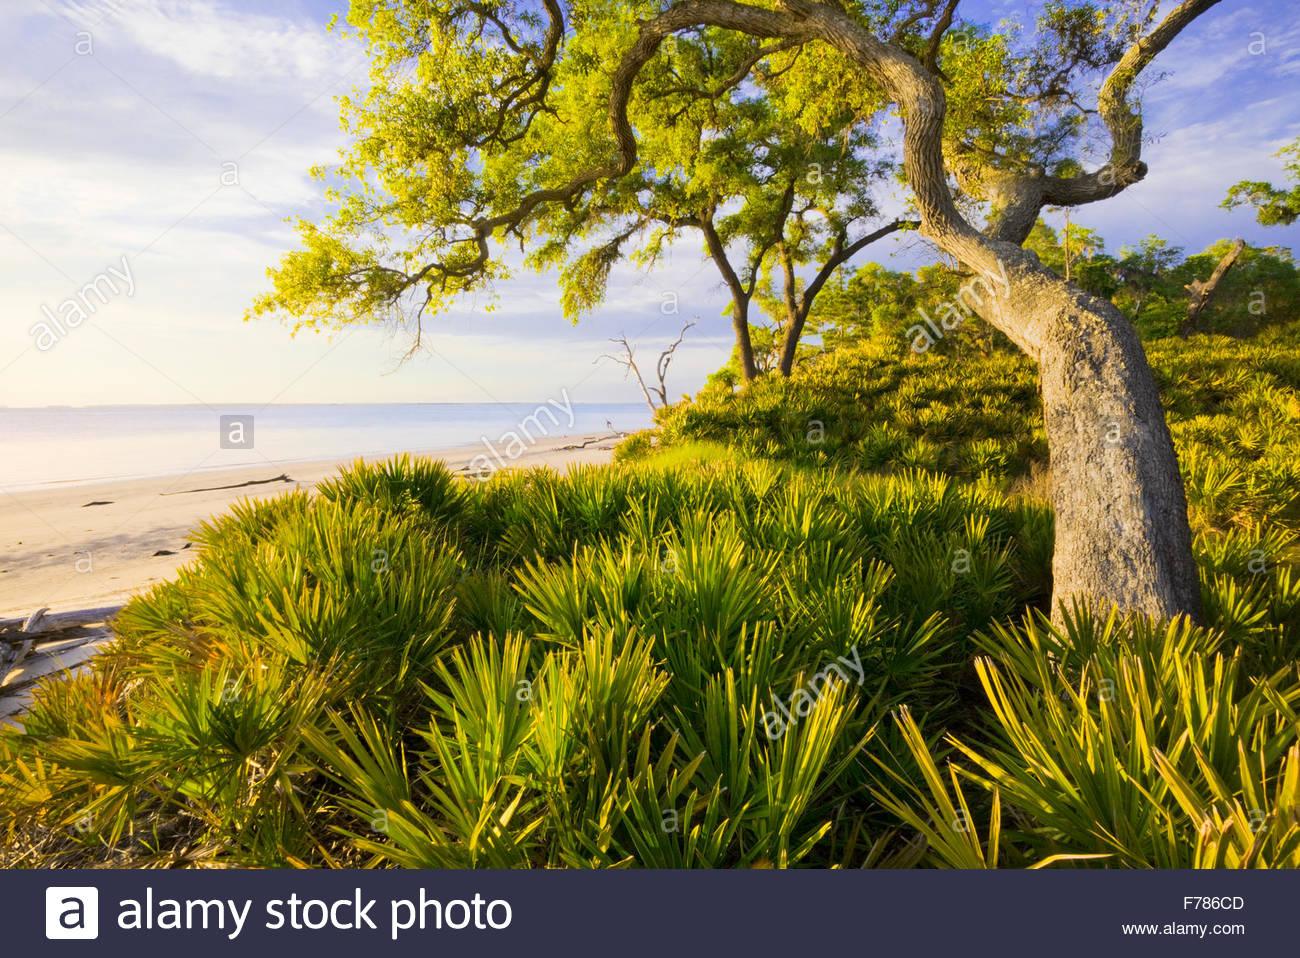 'Saw palmetto' e [sabbia live oak] 'St. Catherine's Island' Georgia. Foto Stock